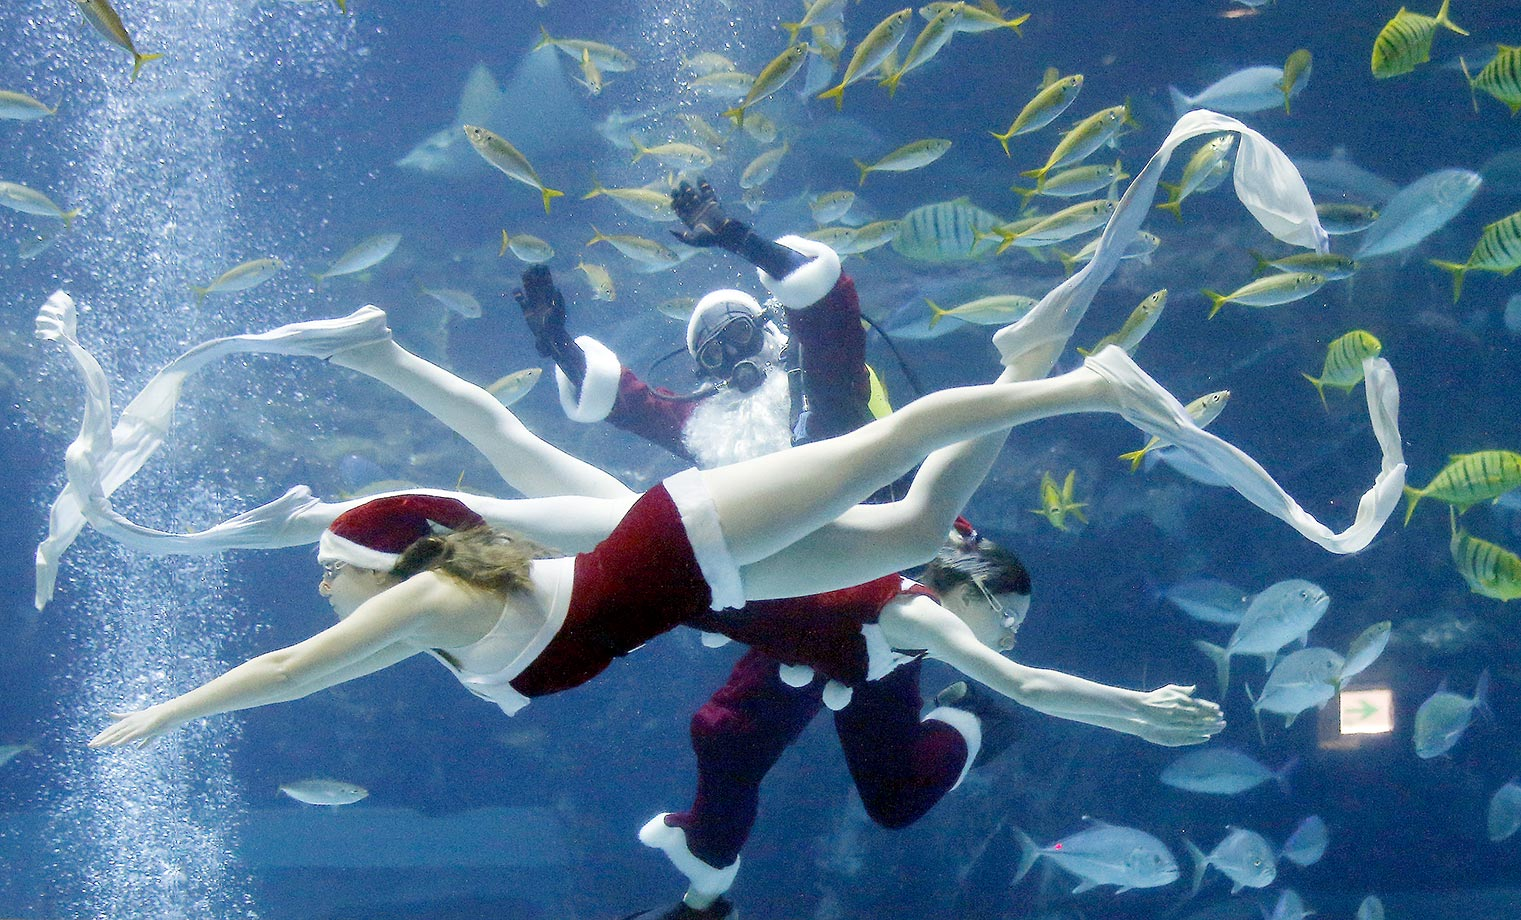 Divers dressed as Santa Claus perform at the Aquaplanet in Goyang, South Korea.